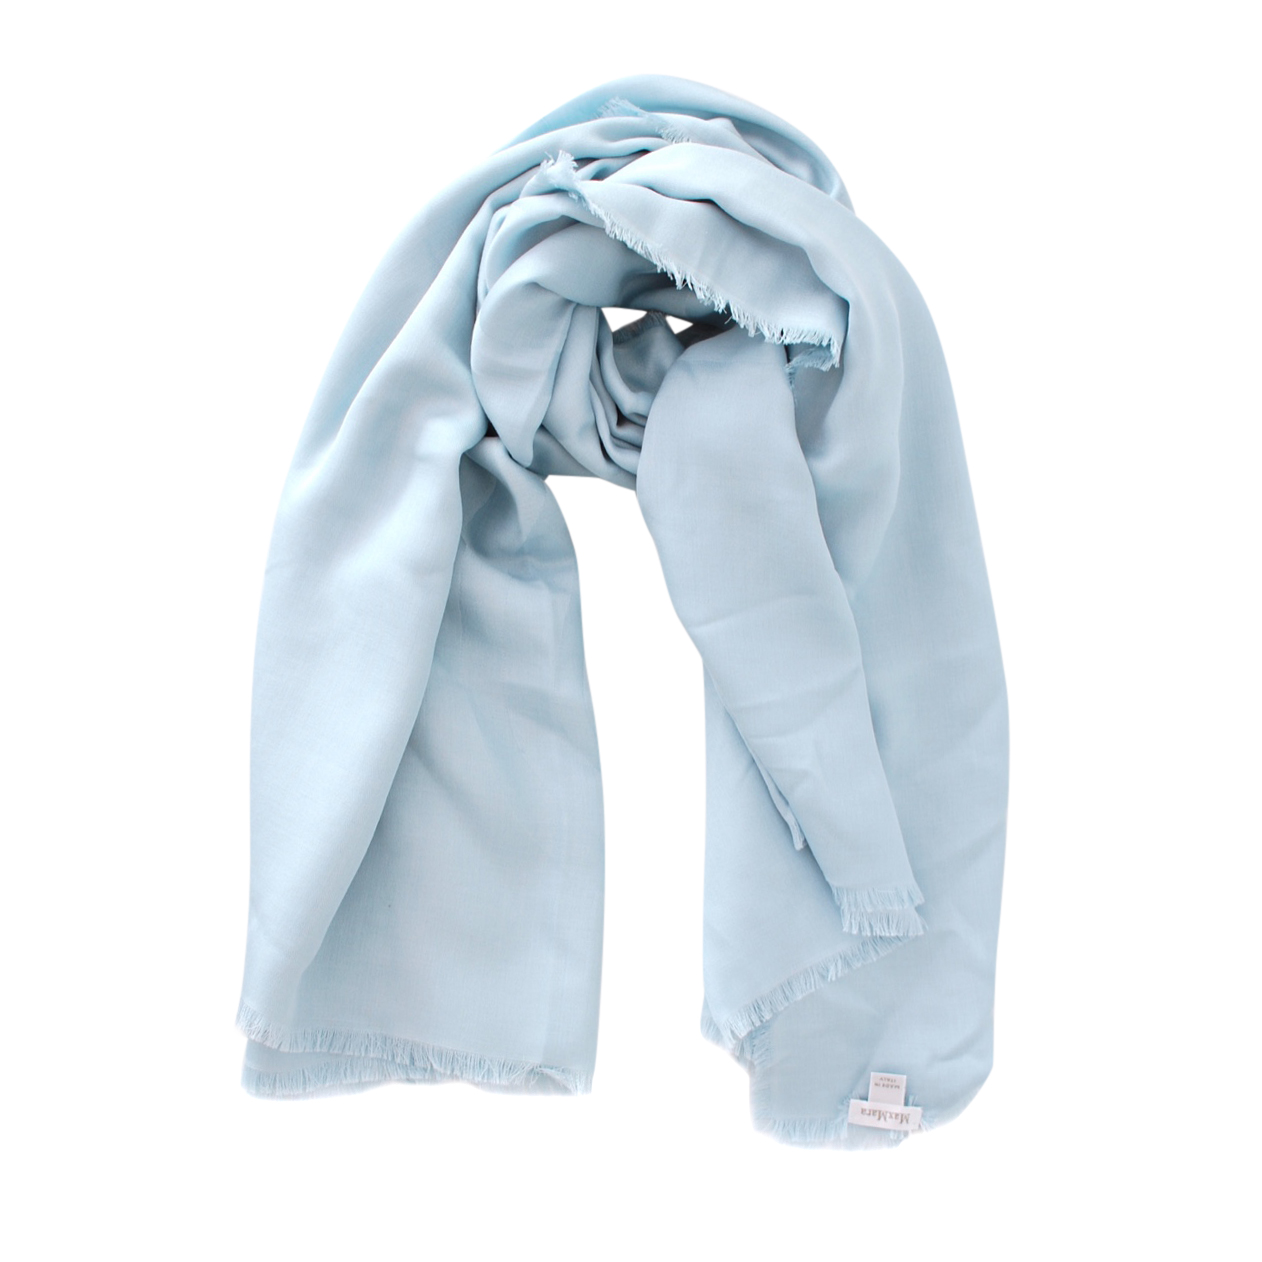 Max Mara Baby Blue Silk & Cotton Shawl